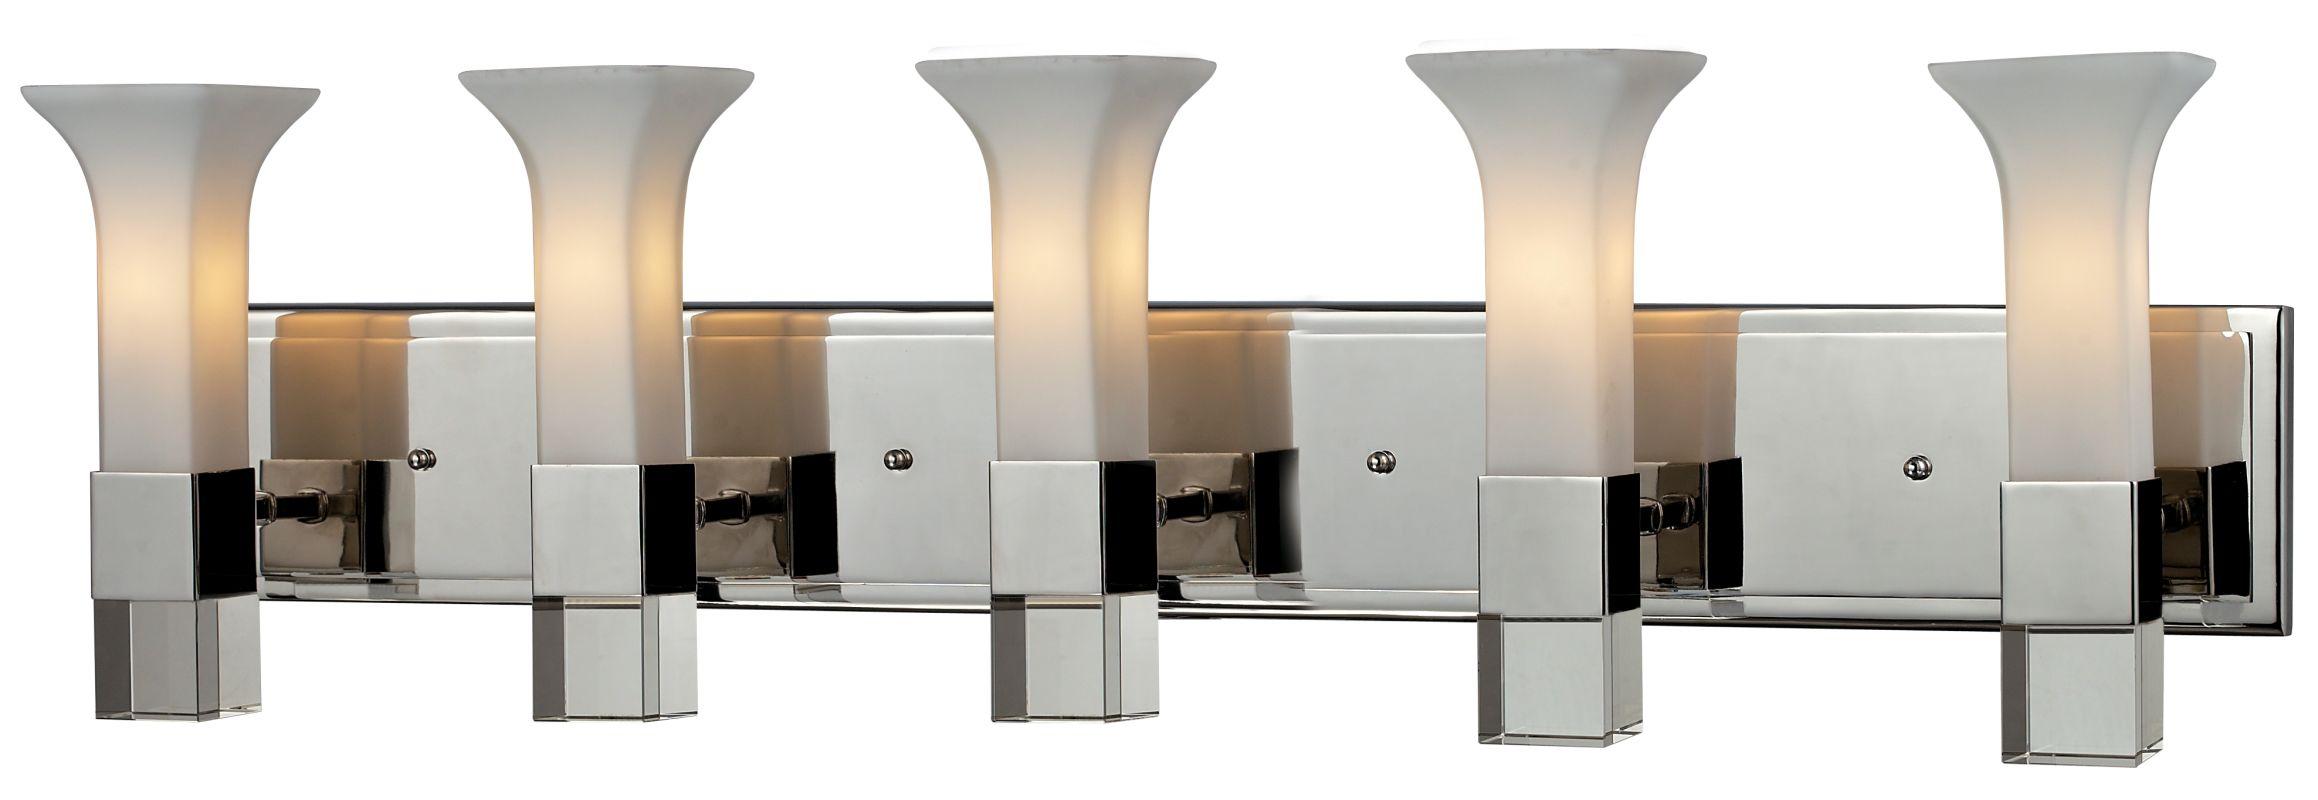 Z-Lite 611-5V Lotus 5 Light Bathroom Vanity Light with Matte Opal